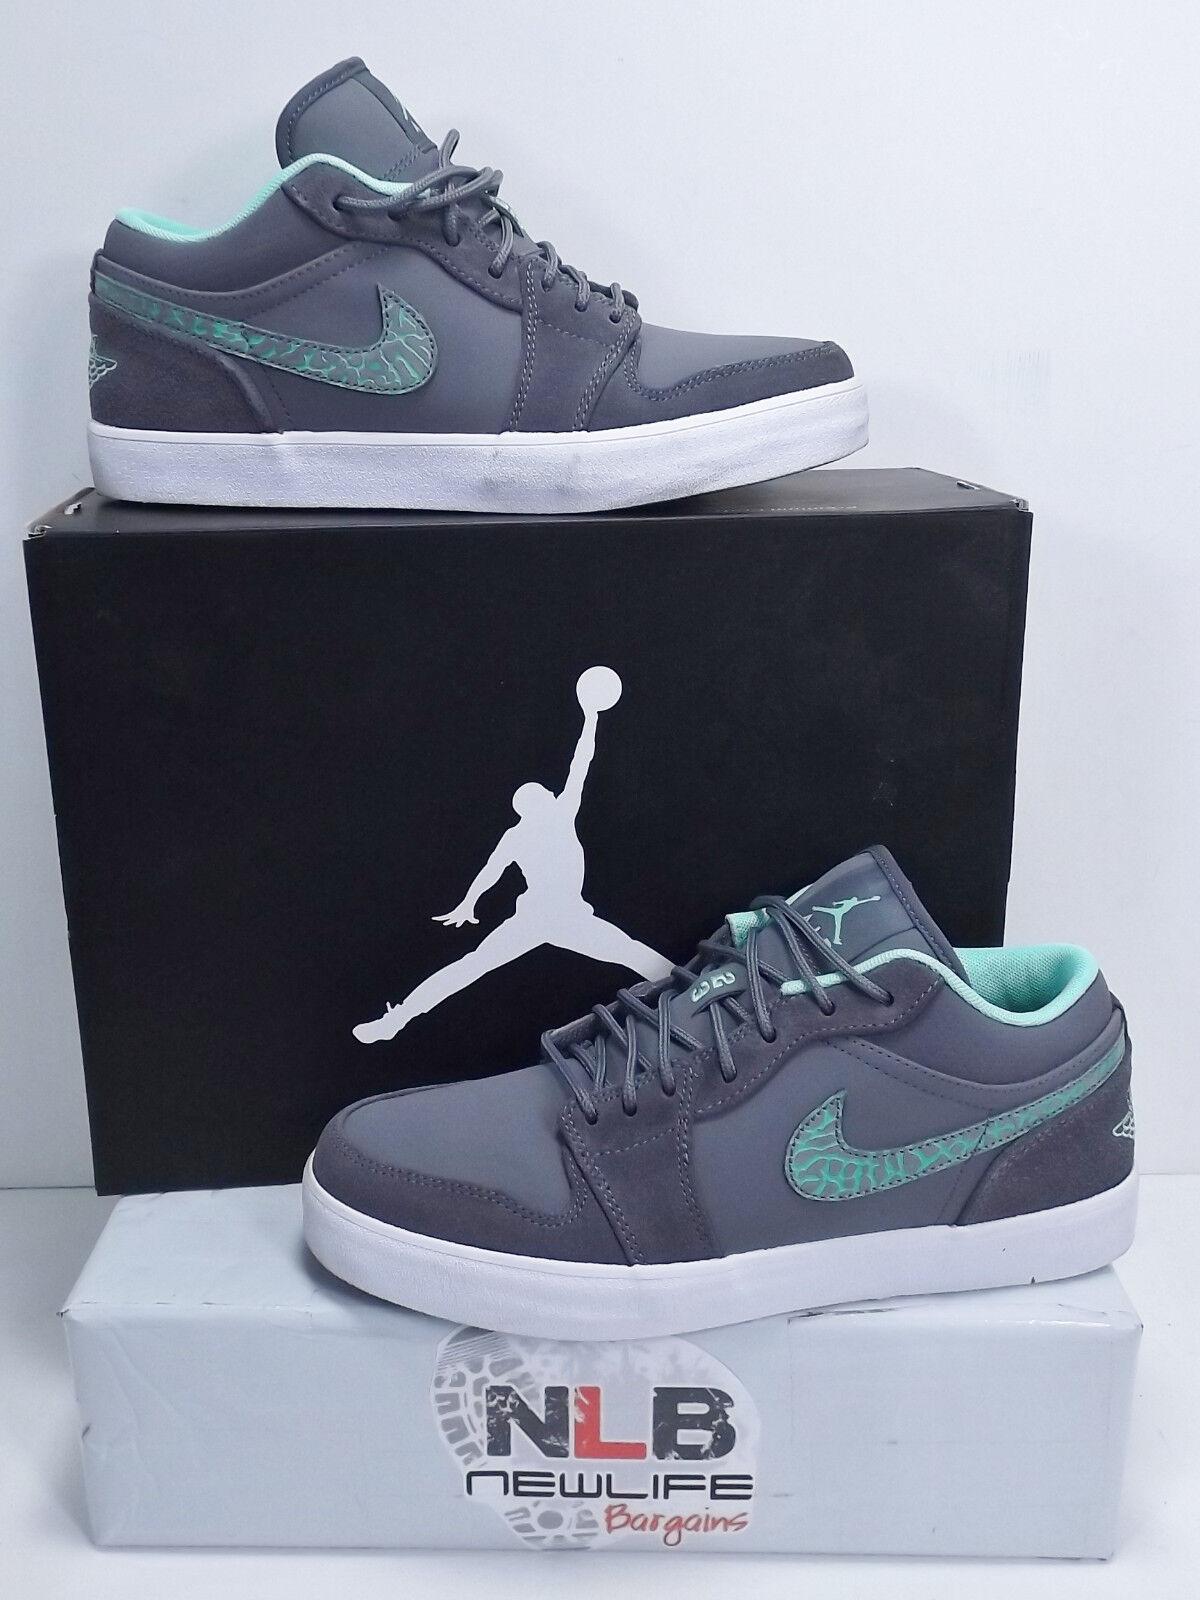 Nike AJ V.2 Low 552312-031 Dark Grey/Green Glow/White Comfortable Great discount